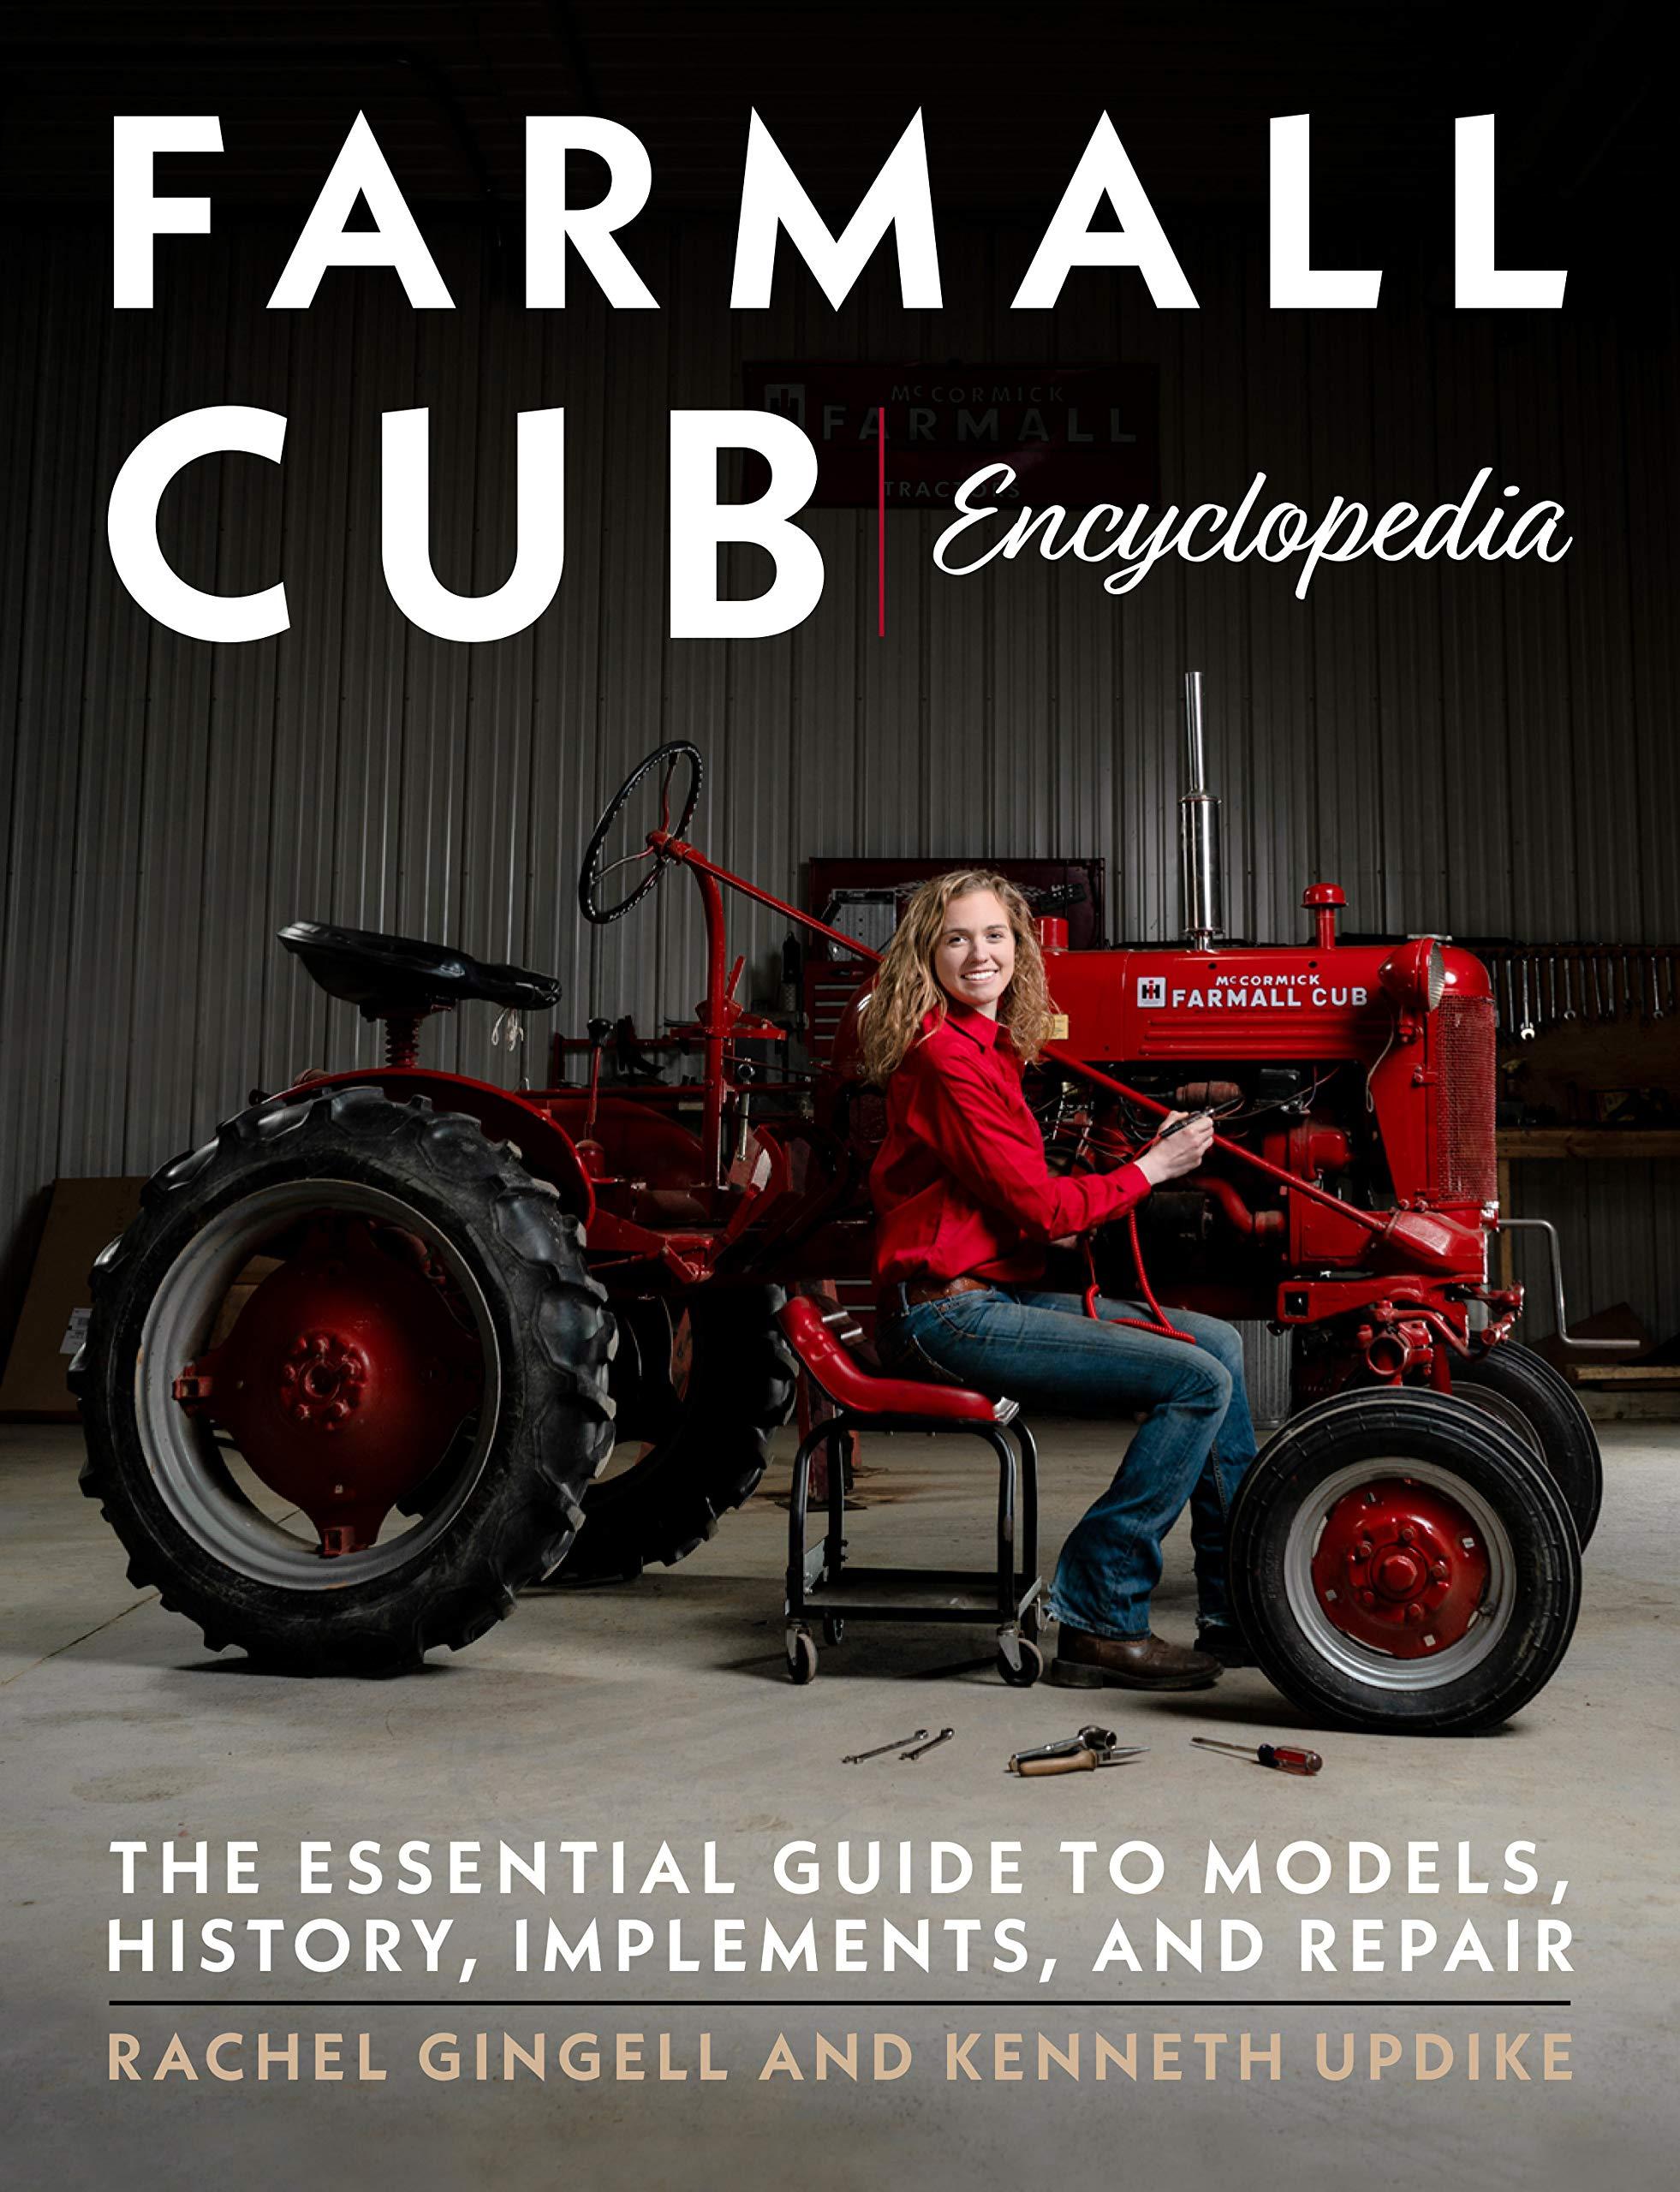 Cub Encyclopedia Farmall Cub